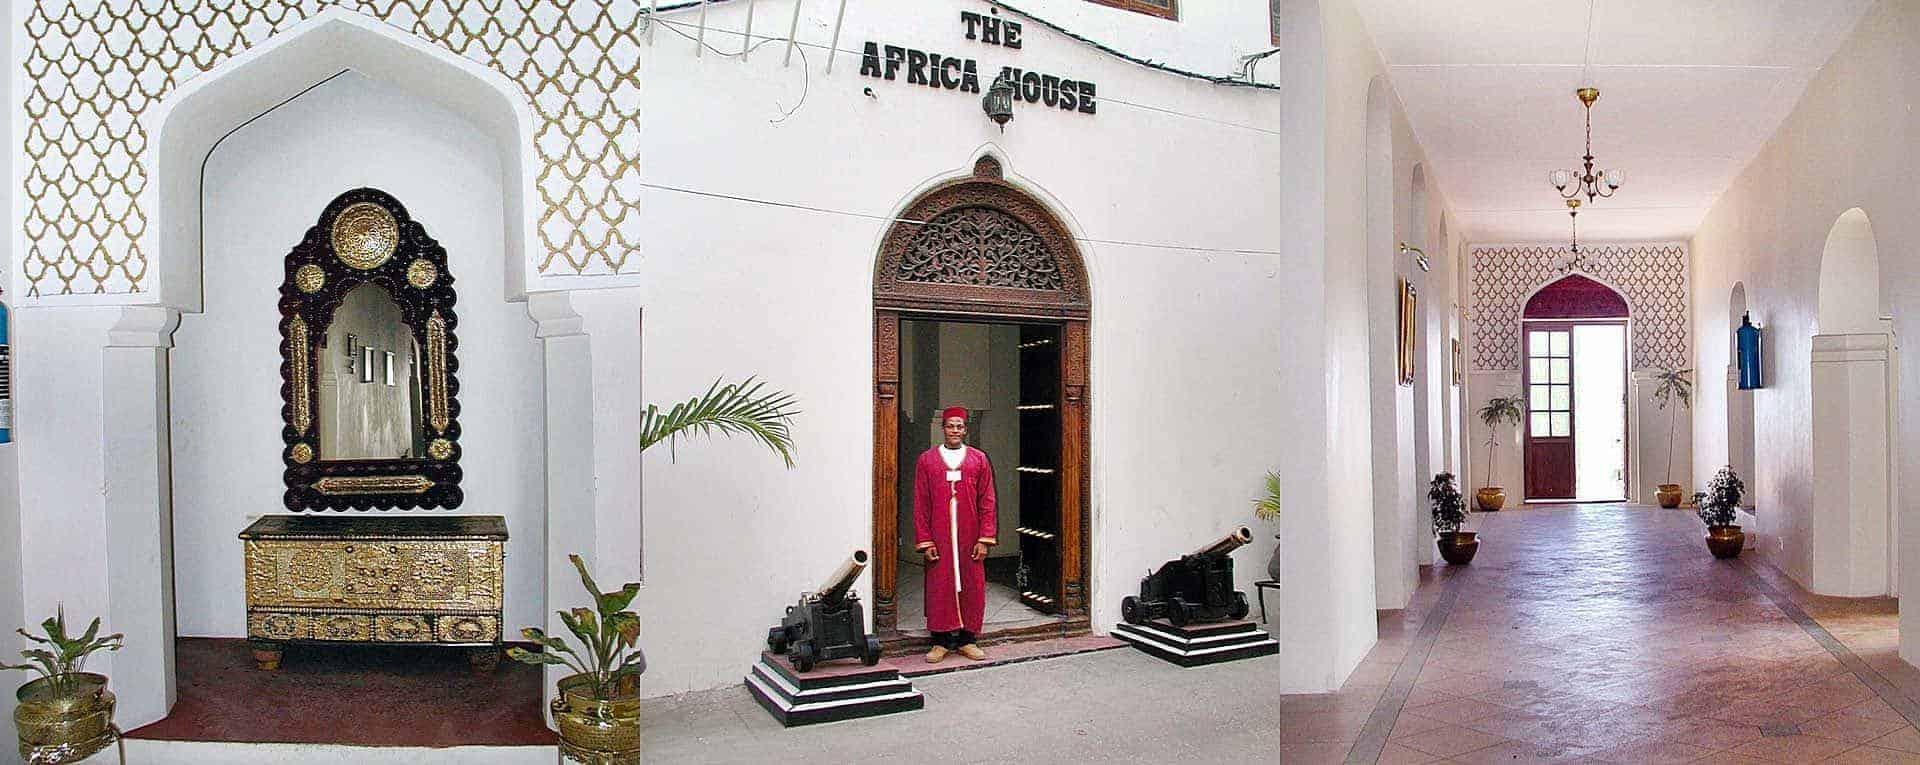 africahousehotel2